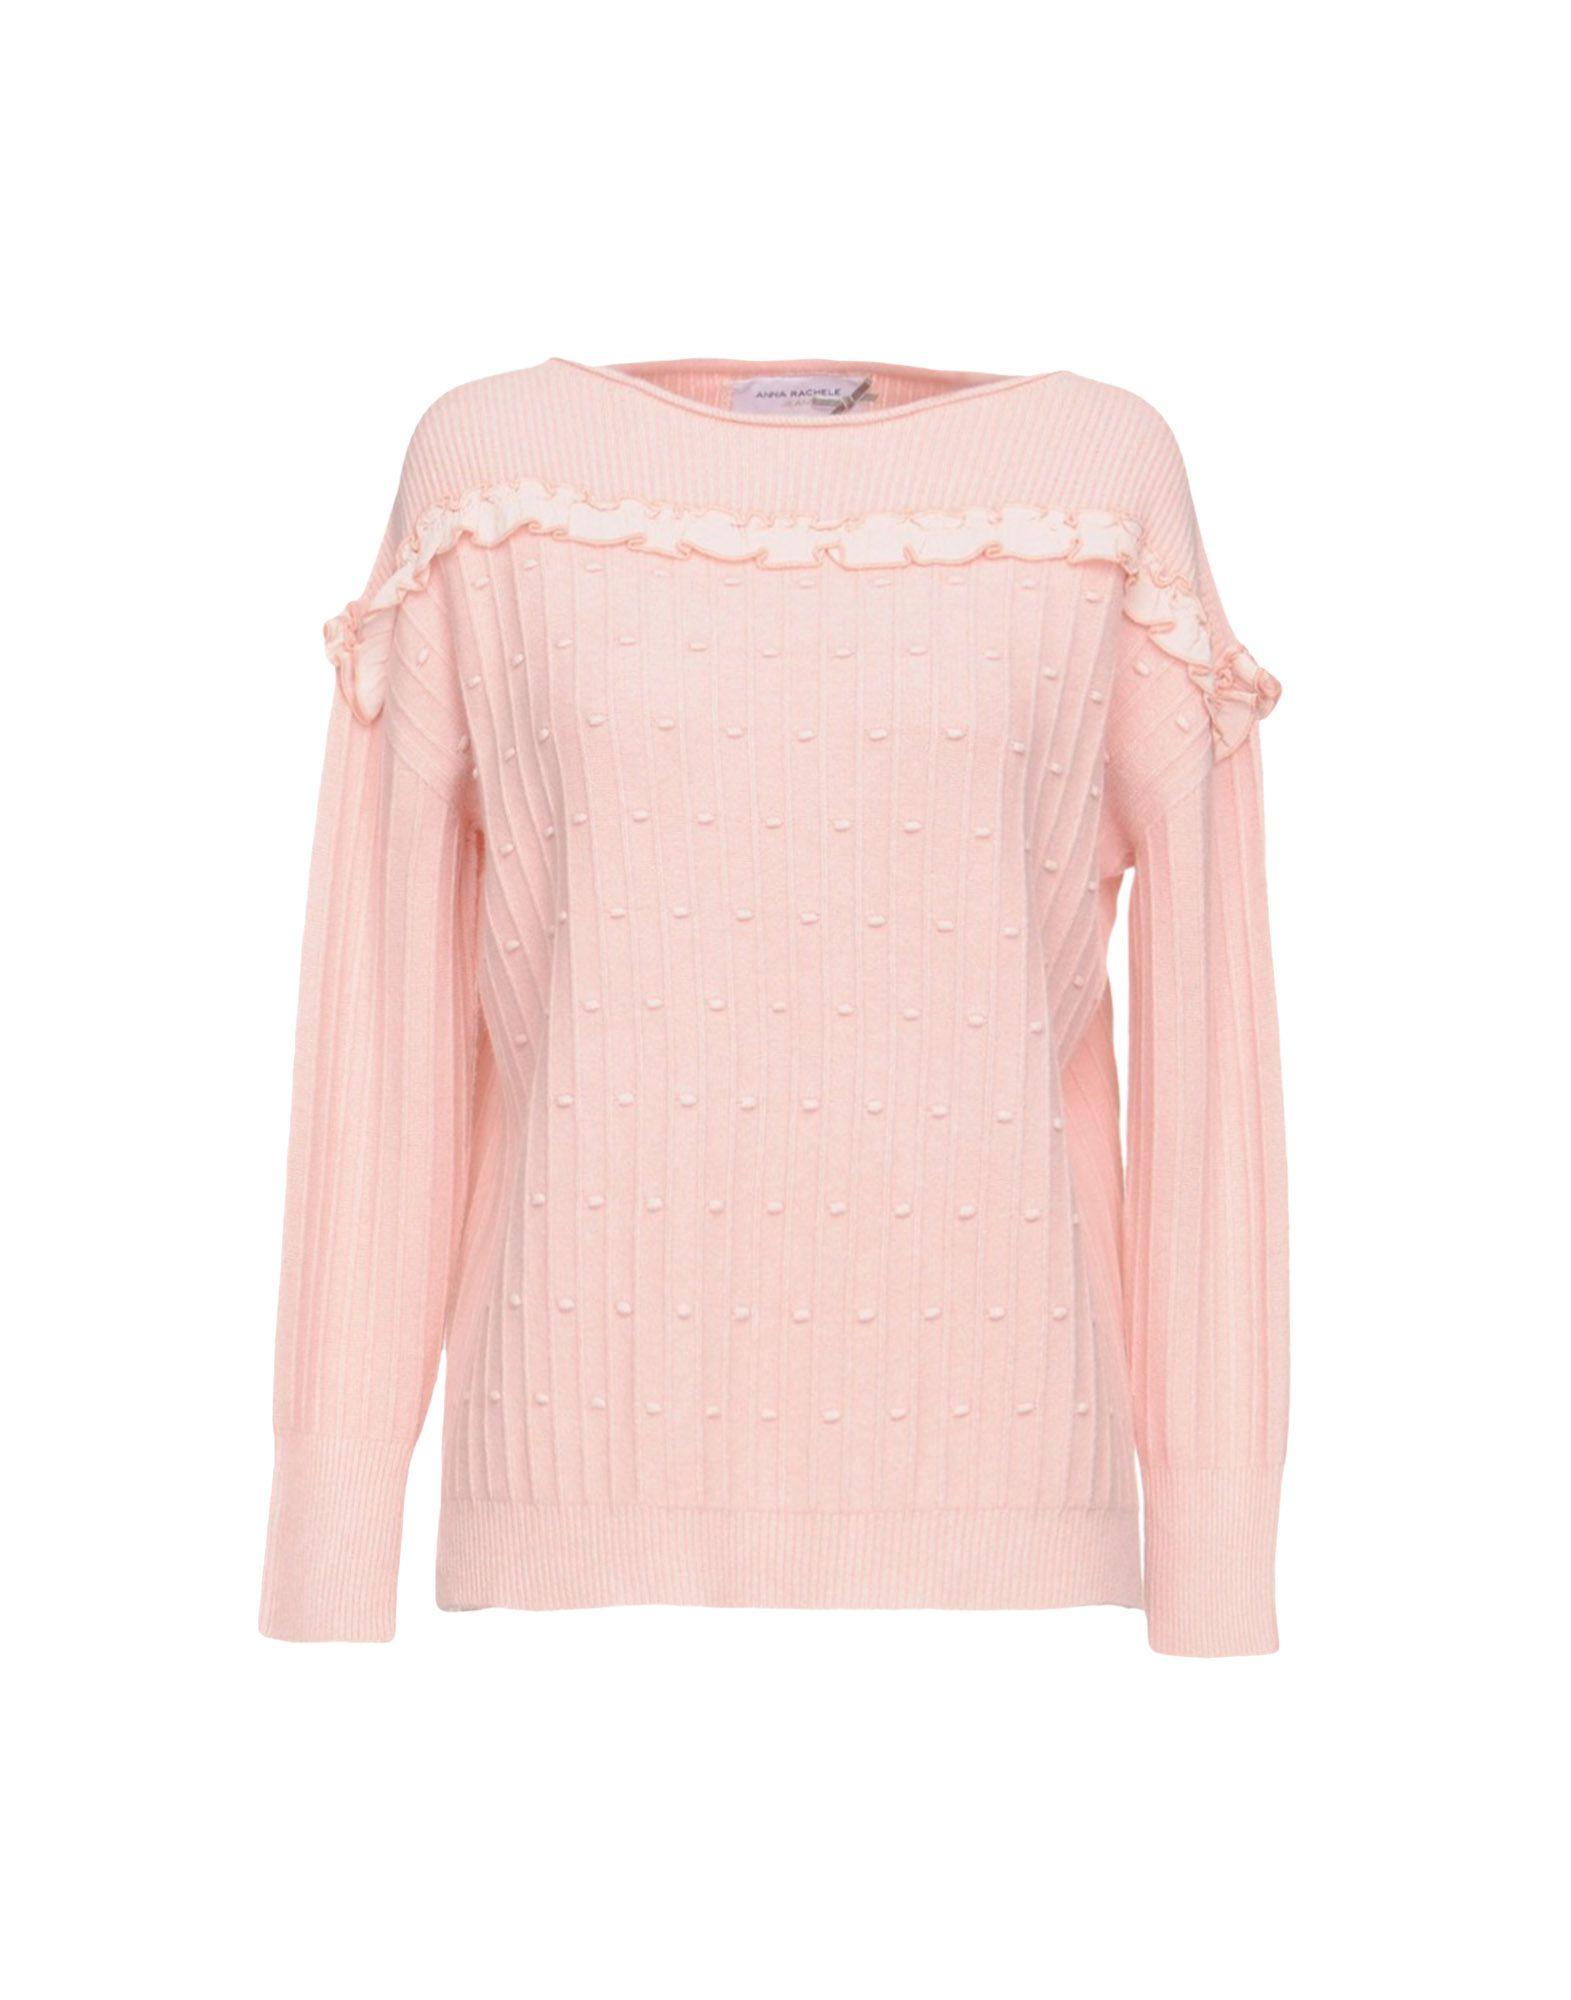 ANNA RACHELE JEANS COLLECTION Damen Pullover Farbe Rosa Größe 7